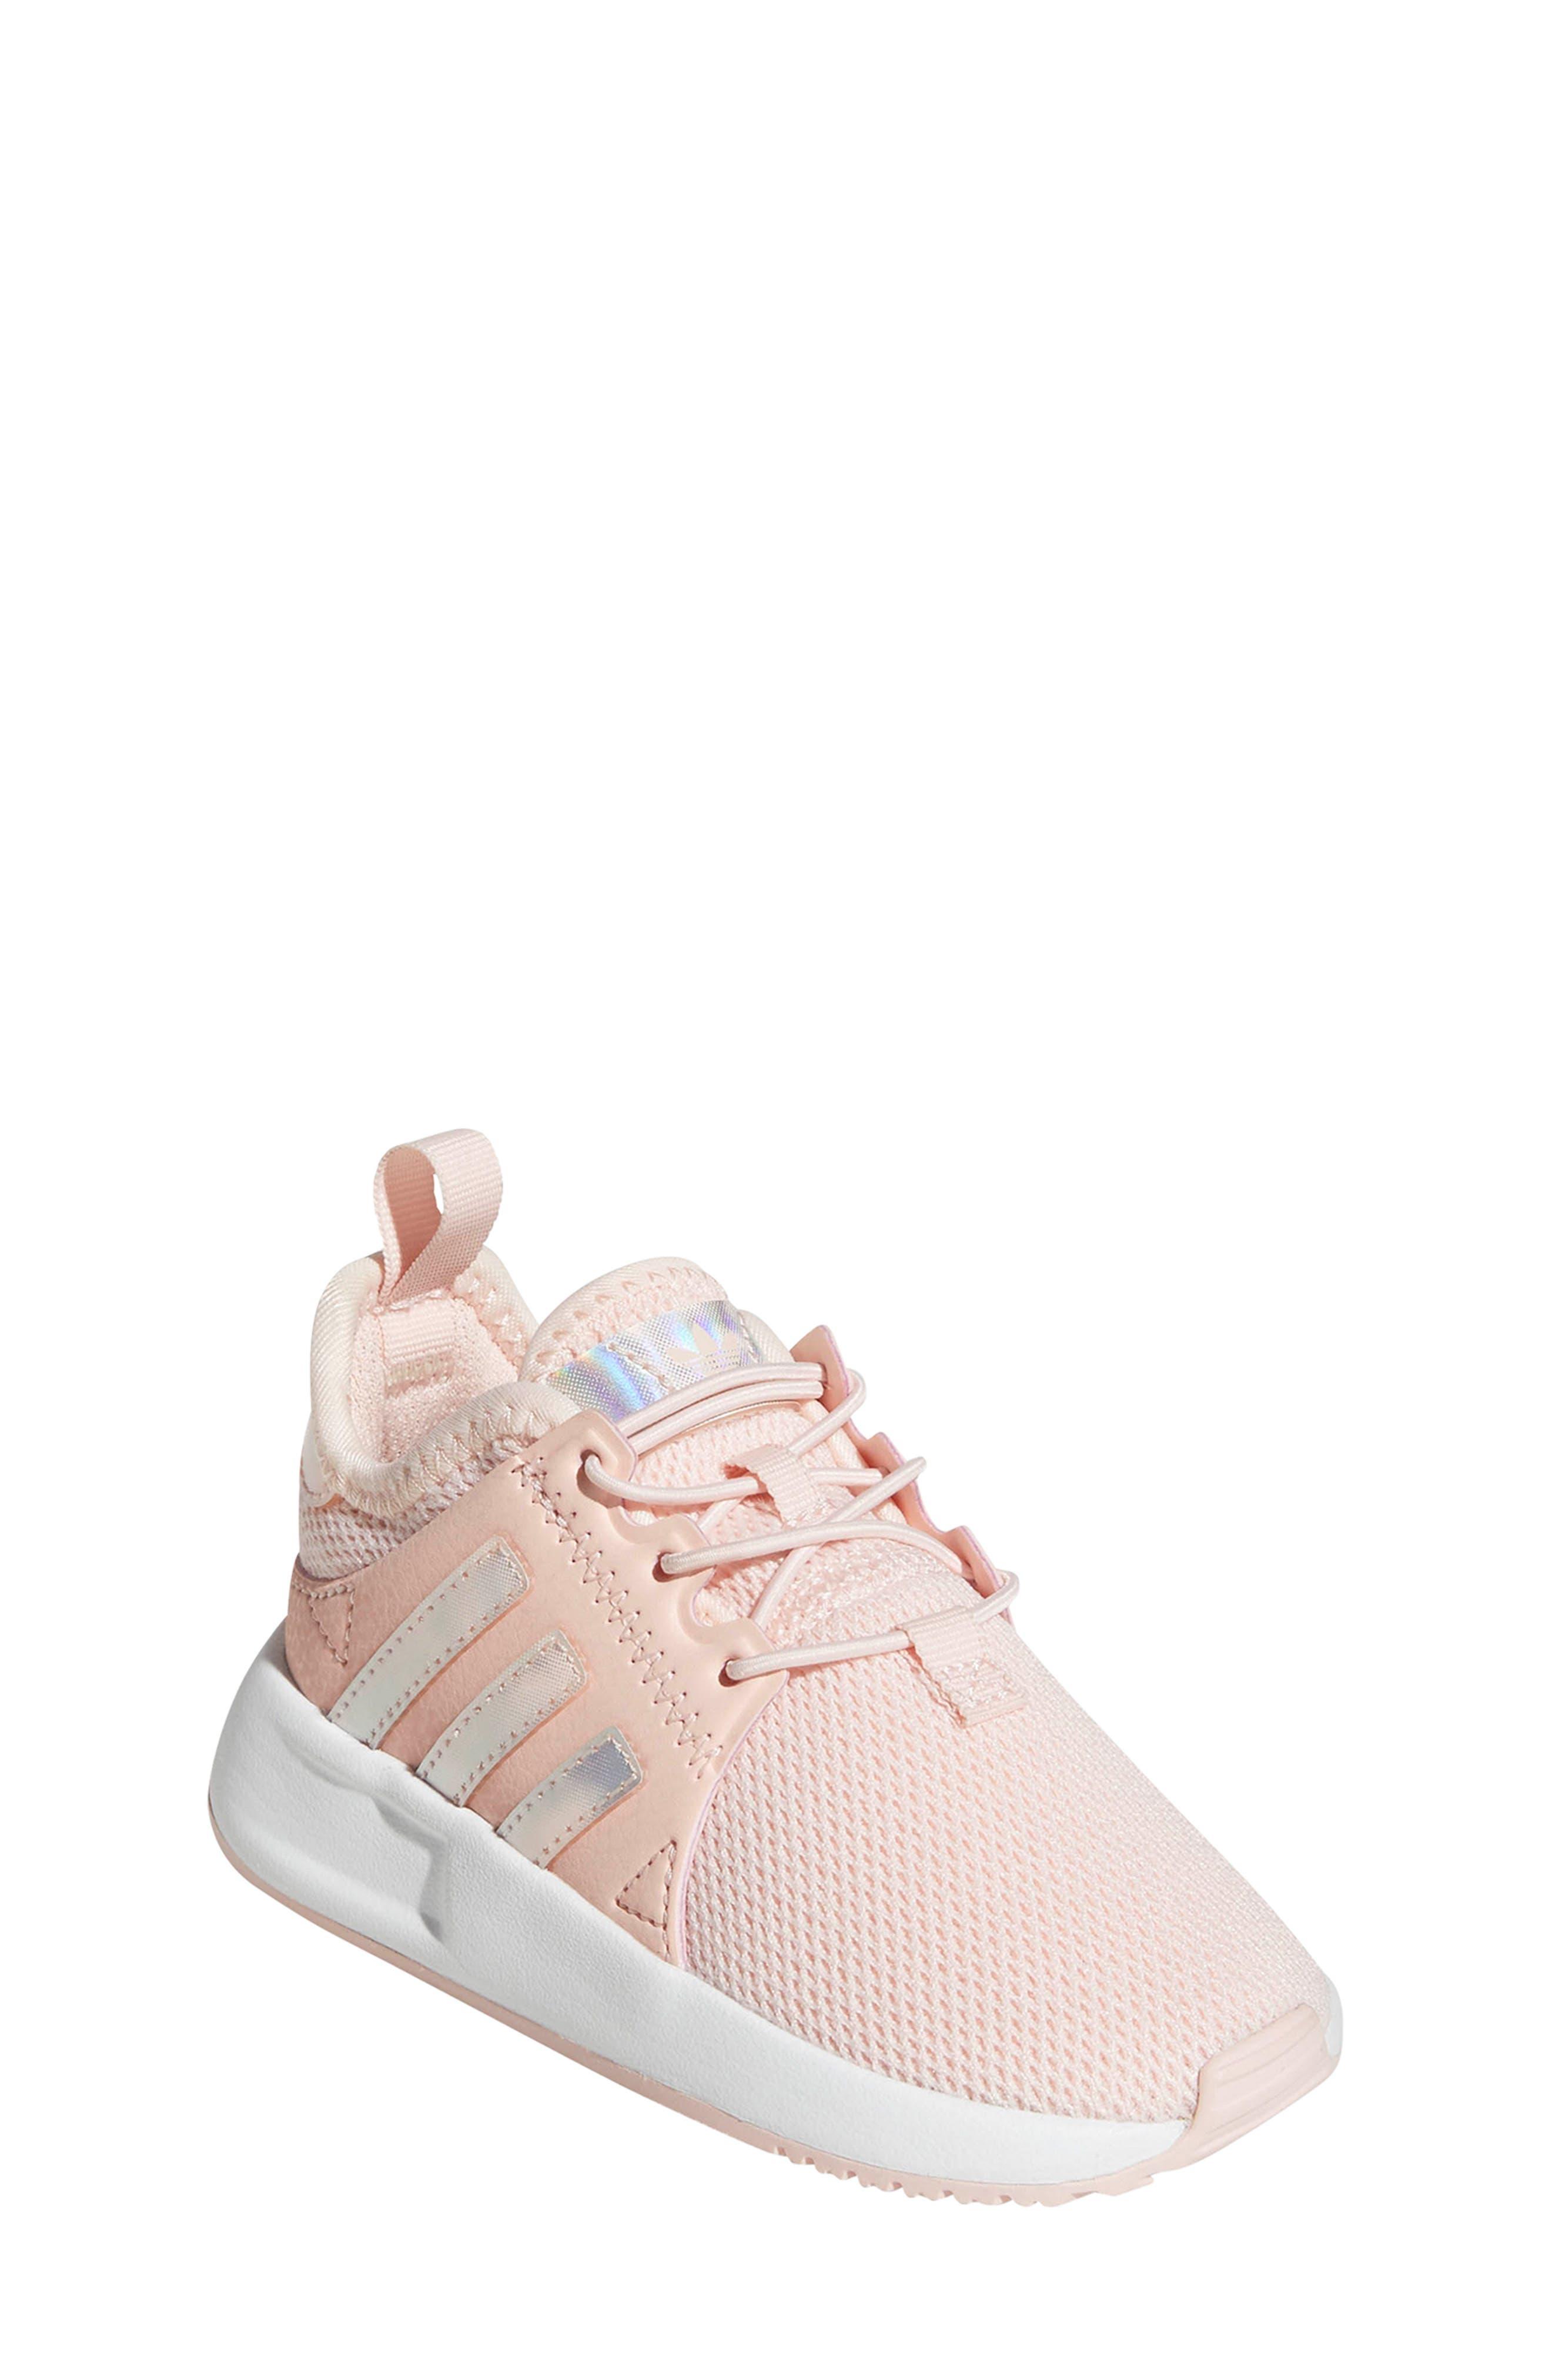 X_PLR Sneaker,                             Main thumbnail 1, color,                             ICE PINK/ WHITE